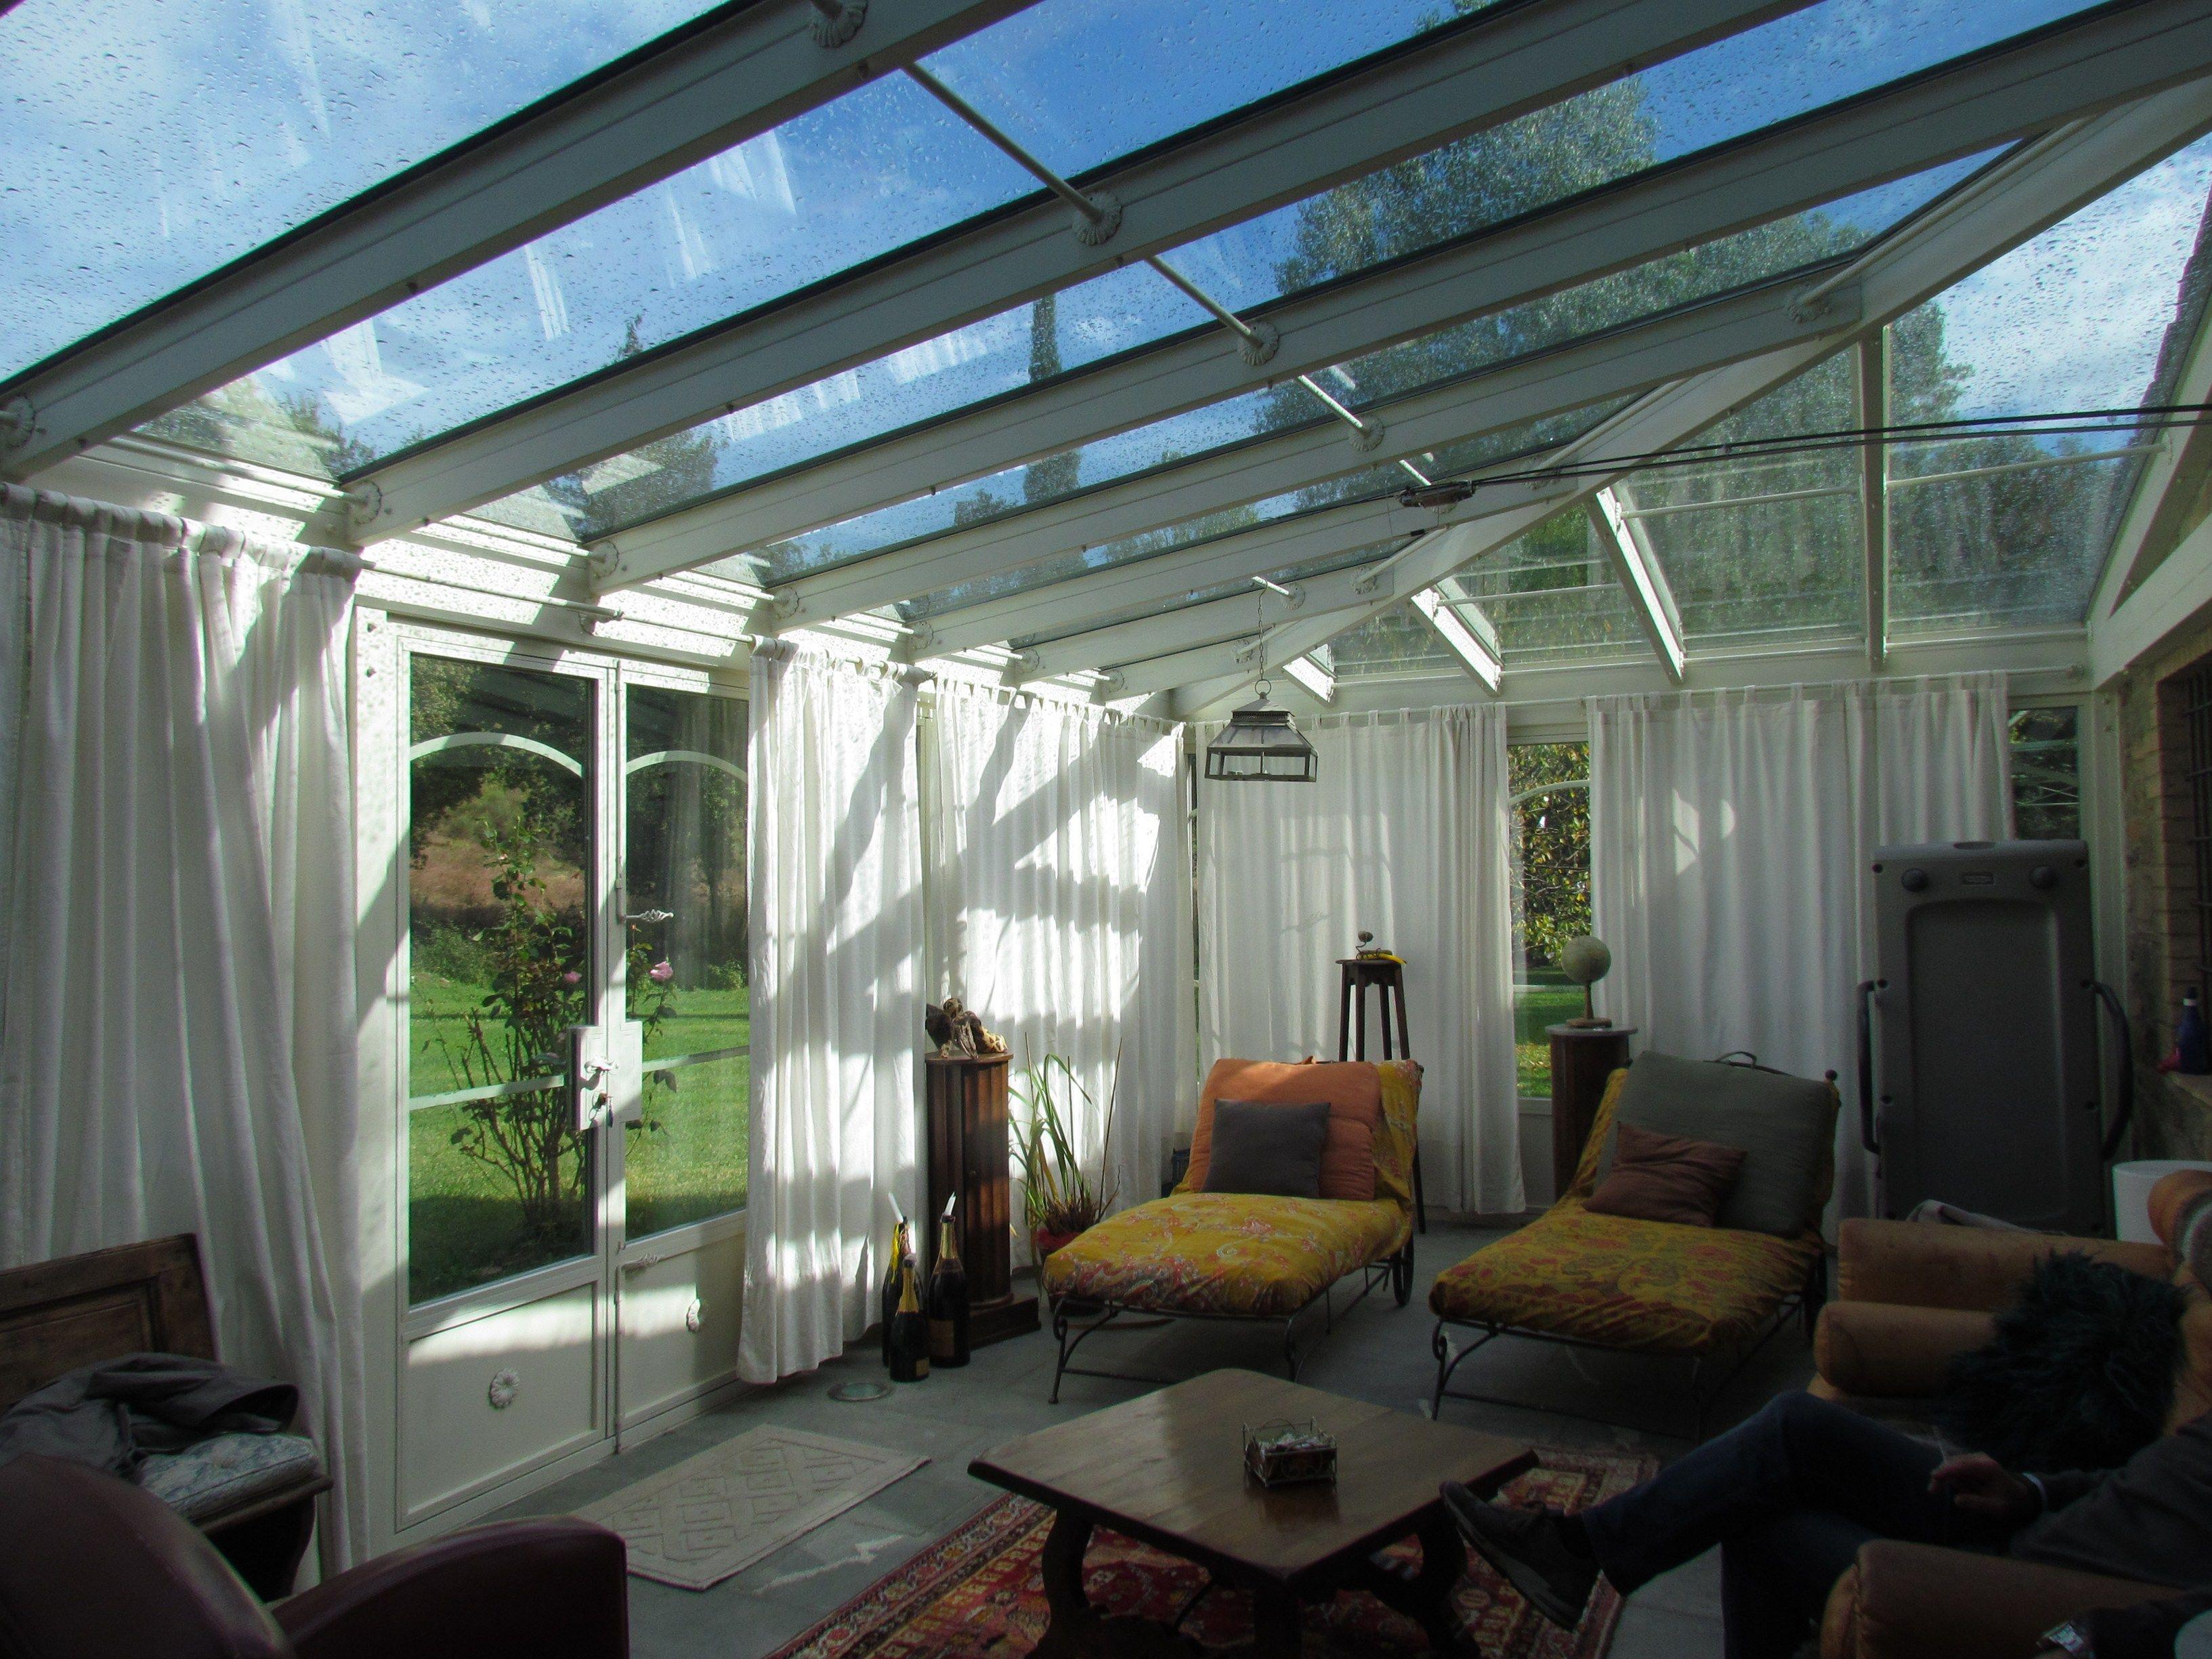 Giardino d 39 inverno giardino d 39 inverno 2 garden house - Giardino d inverno prezzo ...